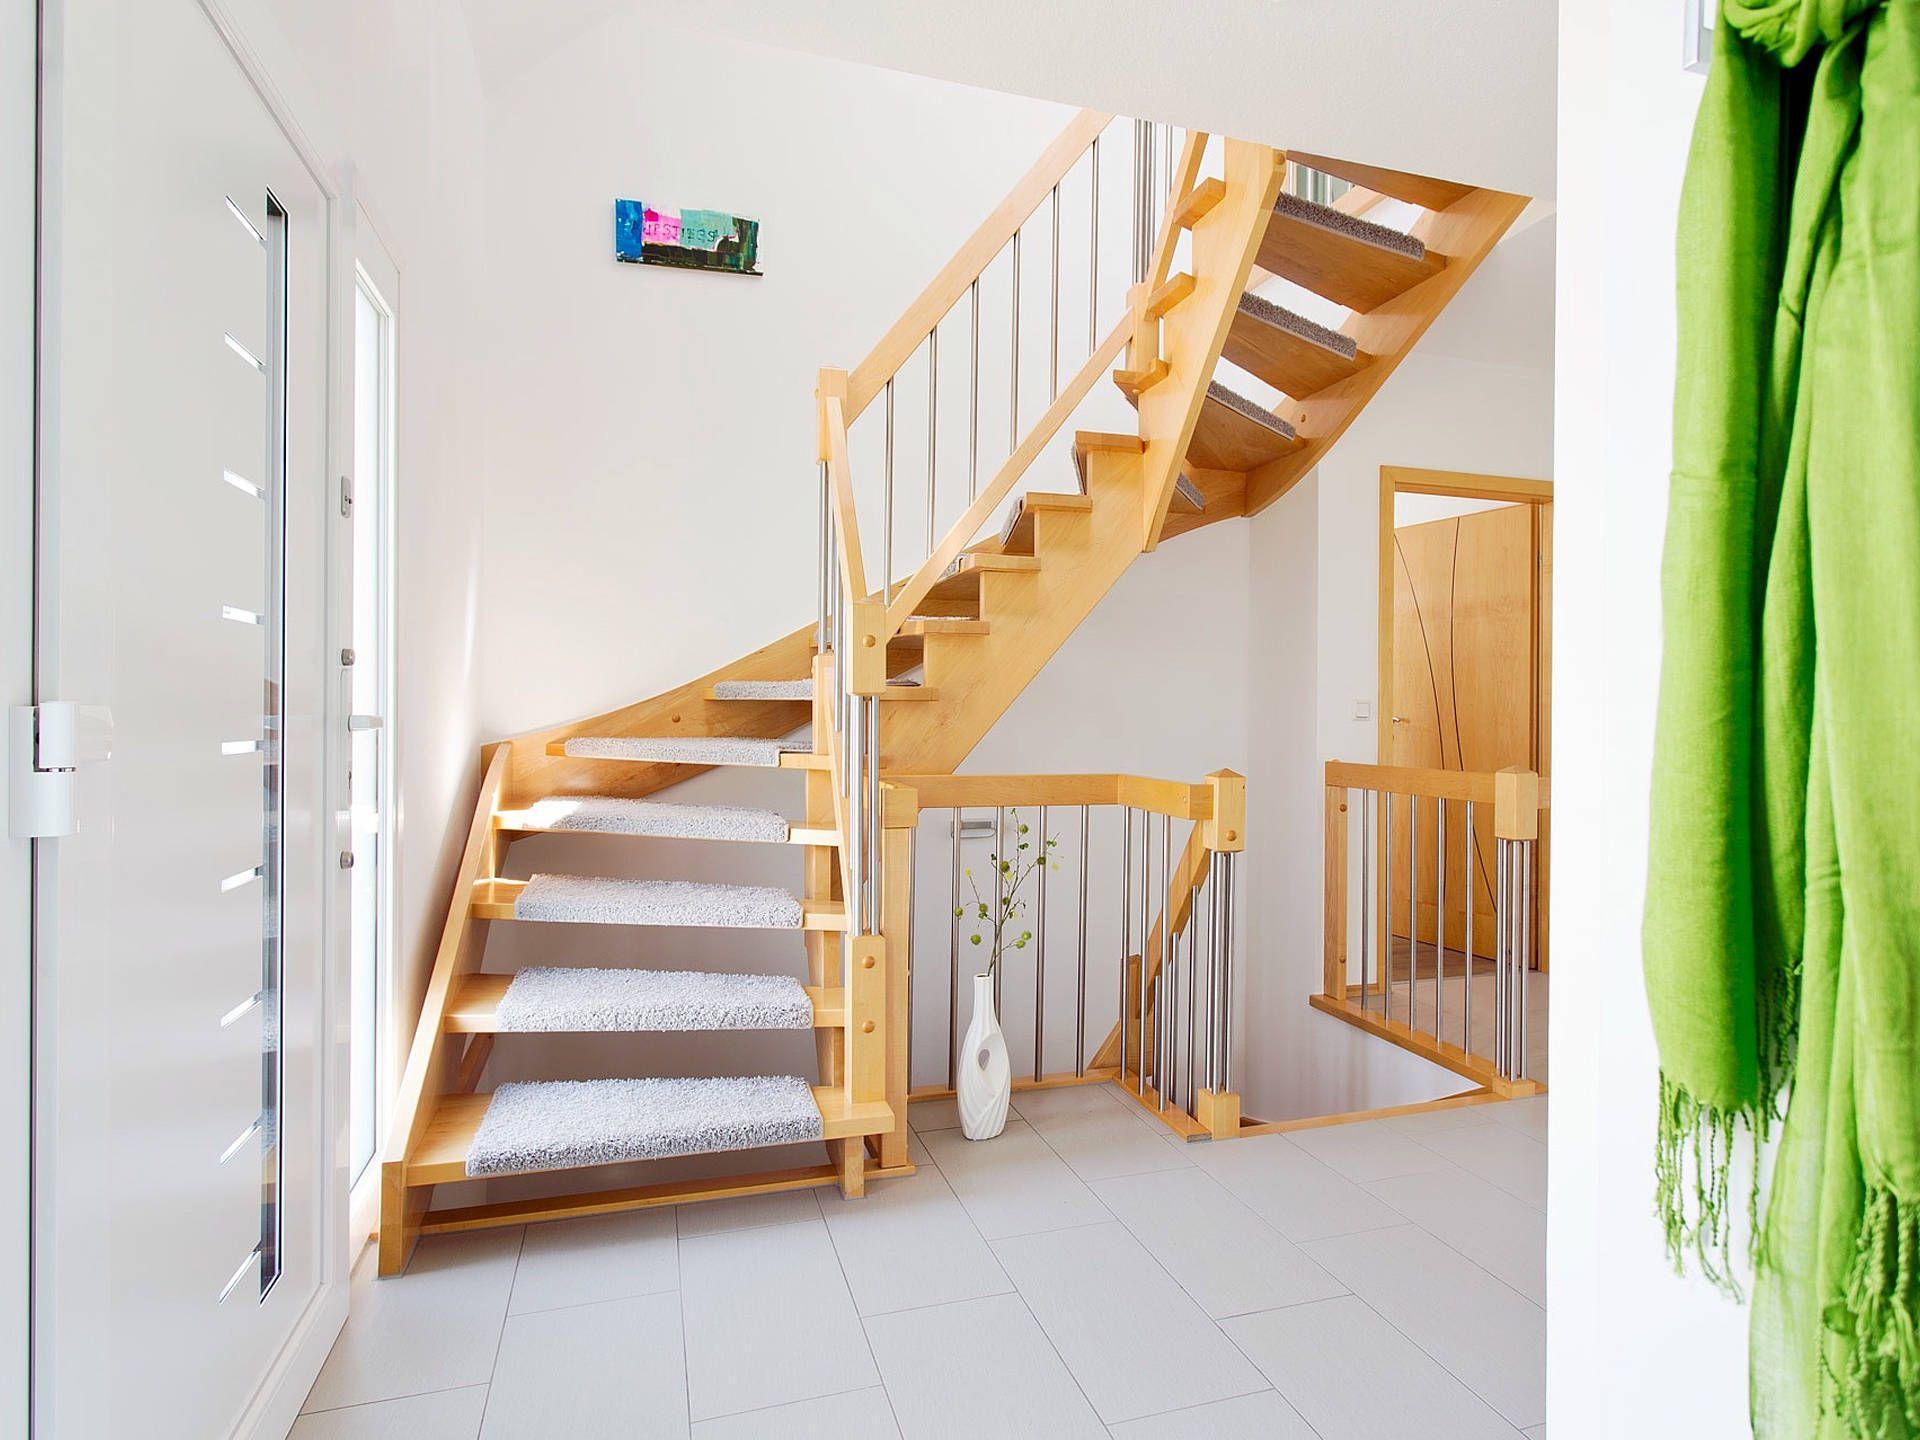 neunkhausen in 2019 treppe pinterest. Black Bedroom Furniture Sets. Home Design Ideas